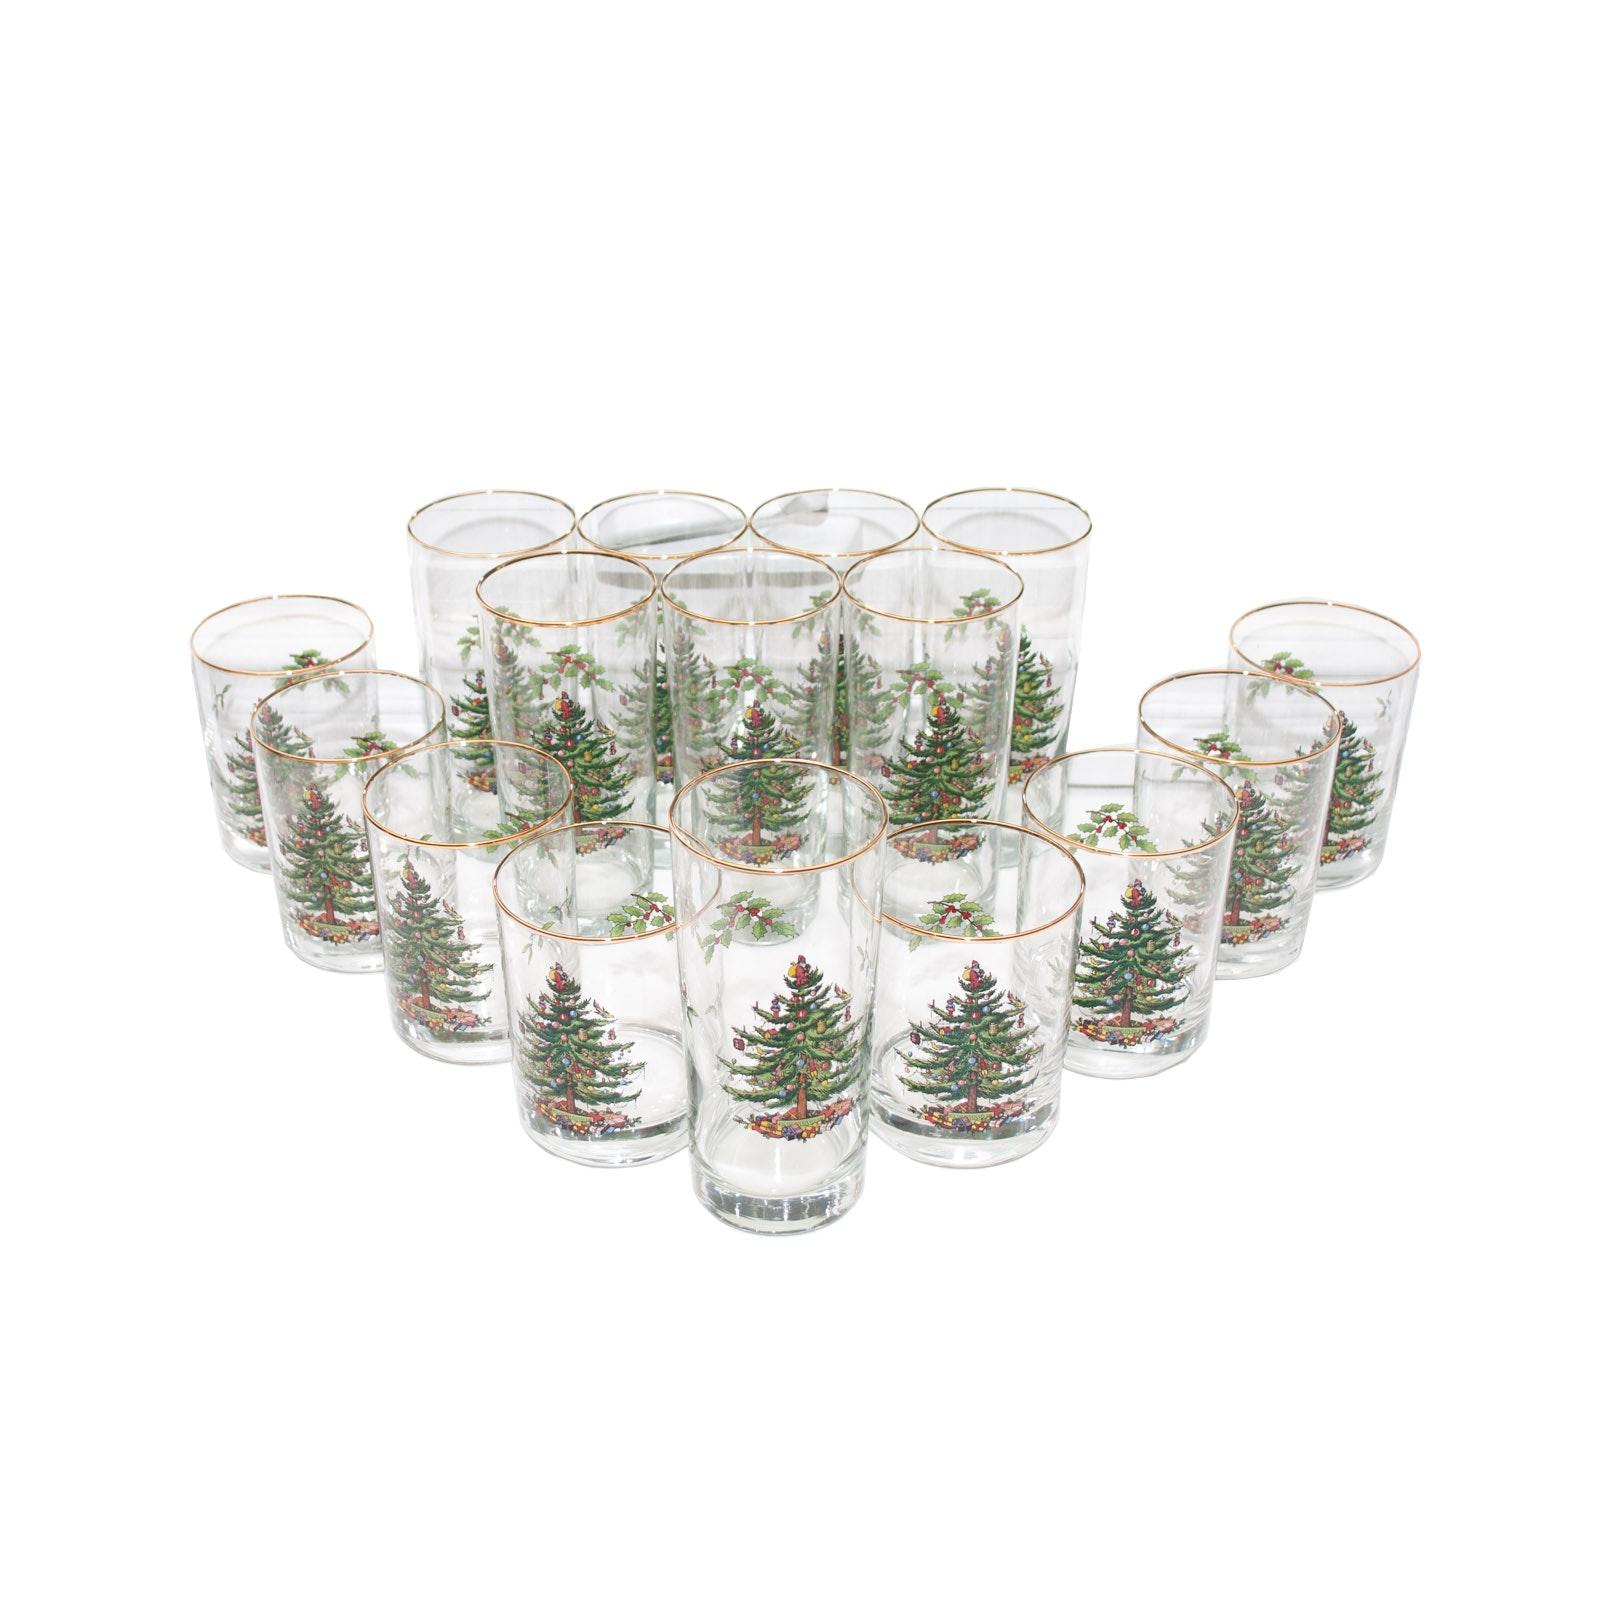 "Set of Spode ""Christmas Tree"" Glassware"